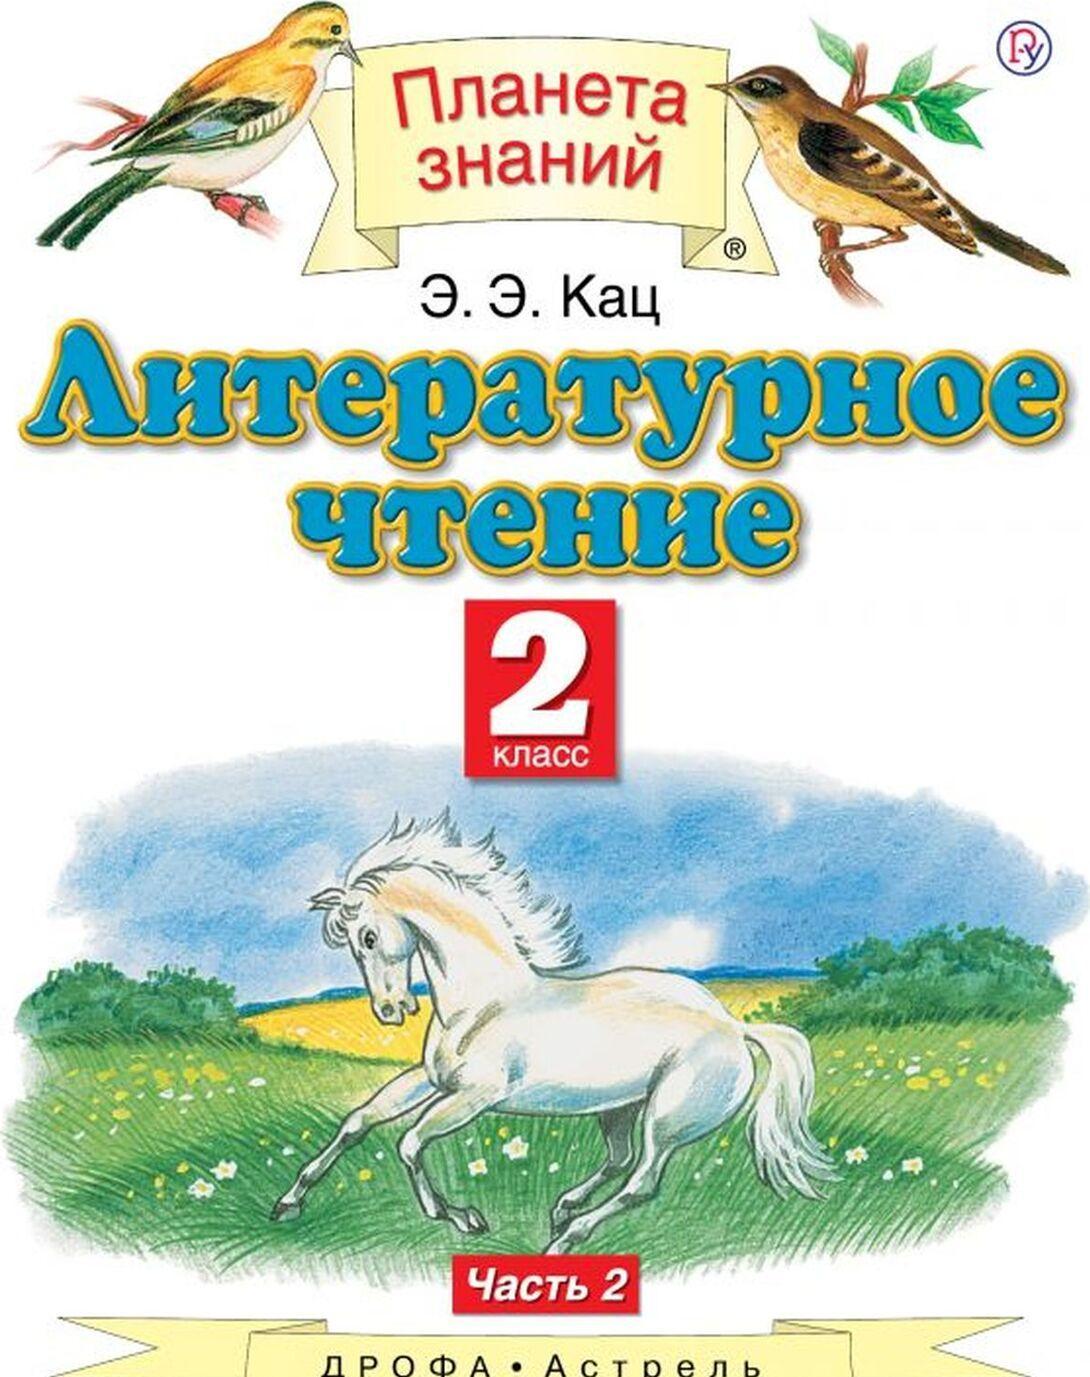 Literaturnoe chtenie. 2 klass. V 2-kh chastjakh. Chast 2 | Kats Ella Elkhanonovna